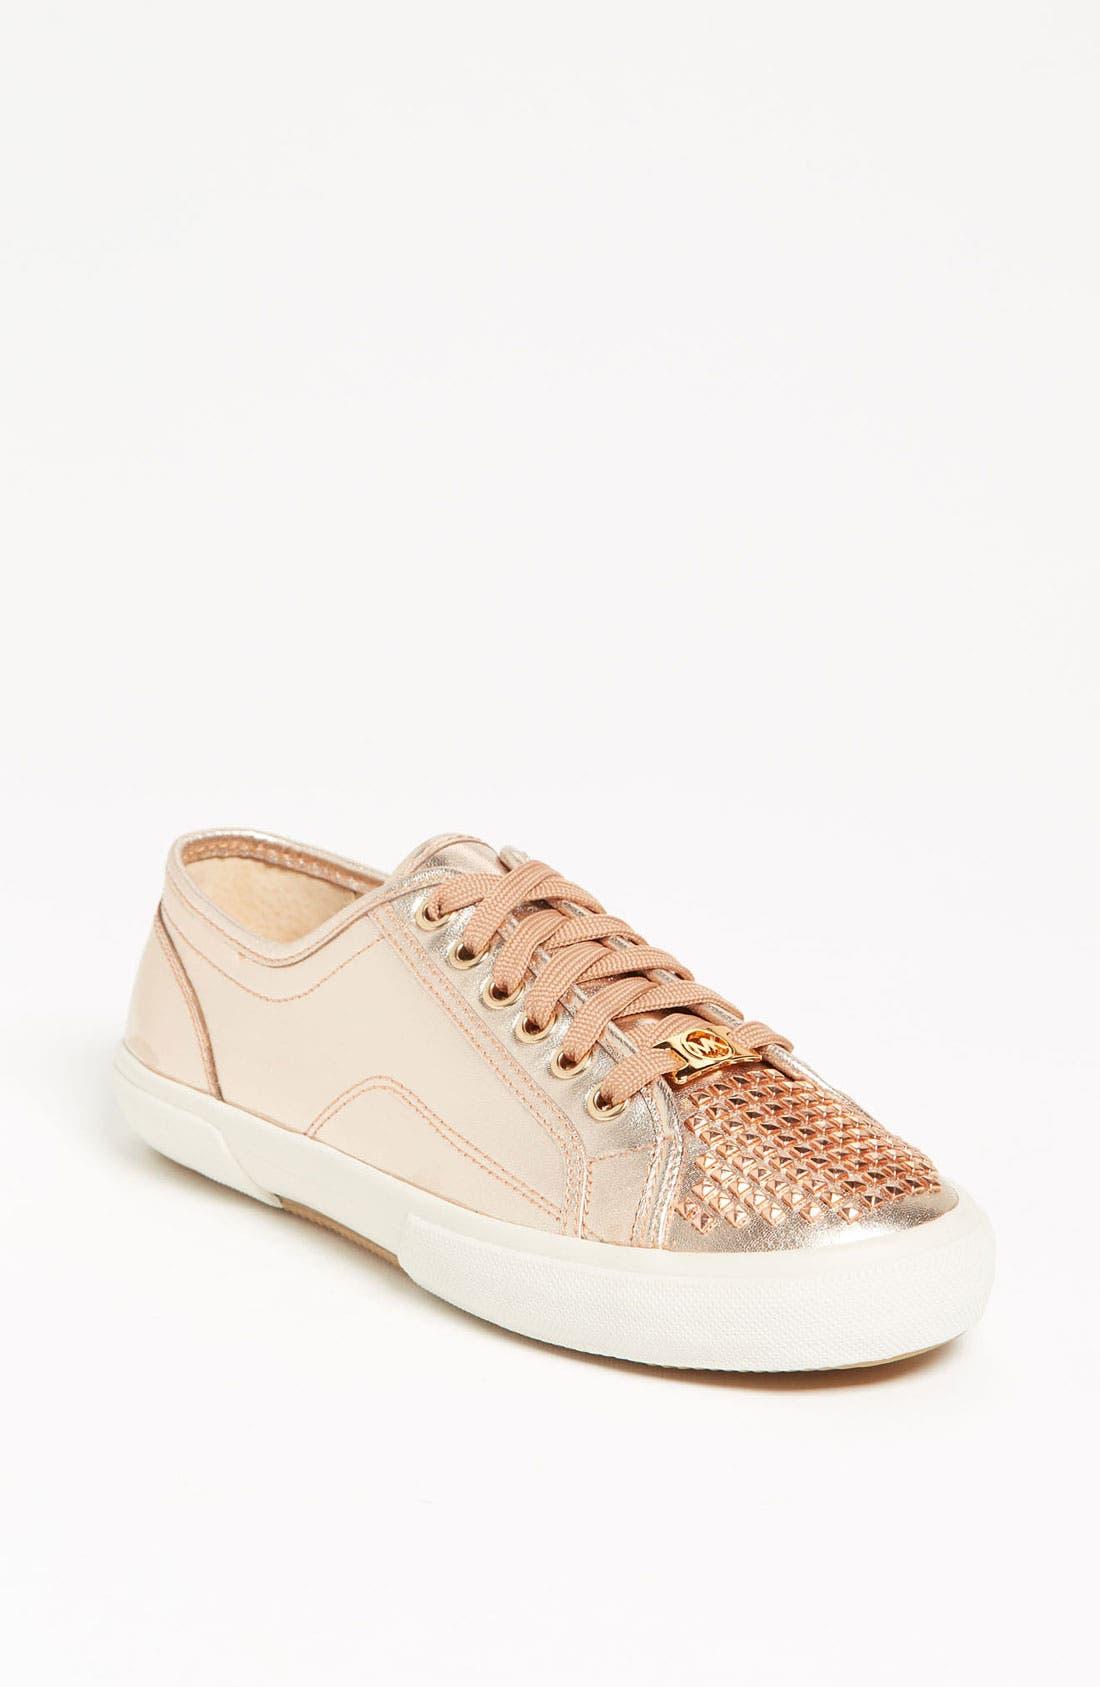 Alternate Image 1 Selected - MICHAEL Michael Kors' Boerum' Studded Sneaker